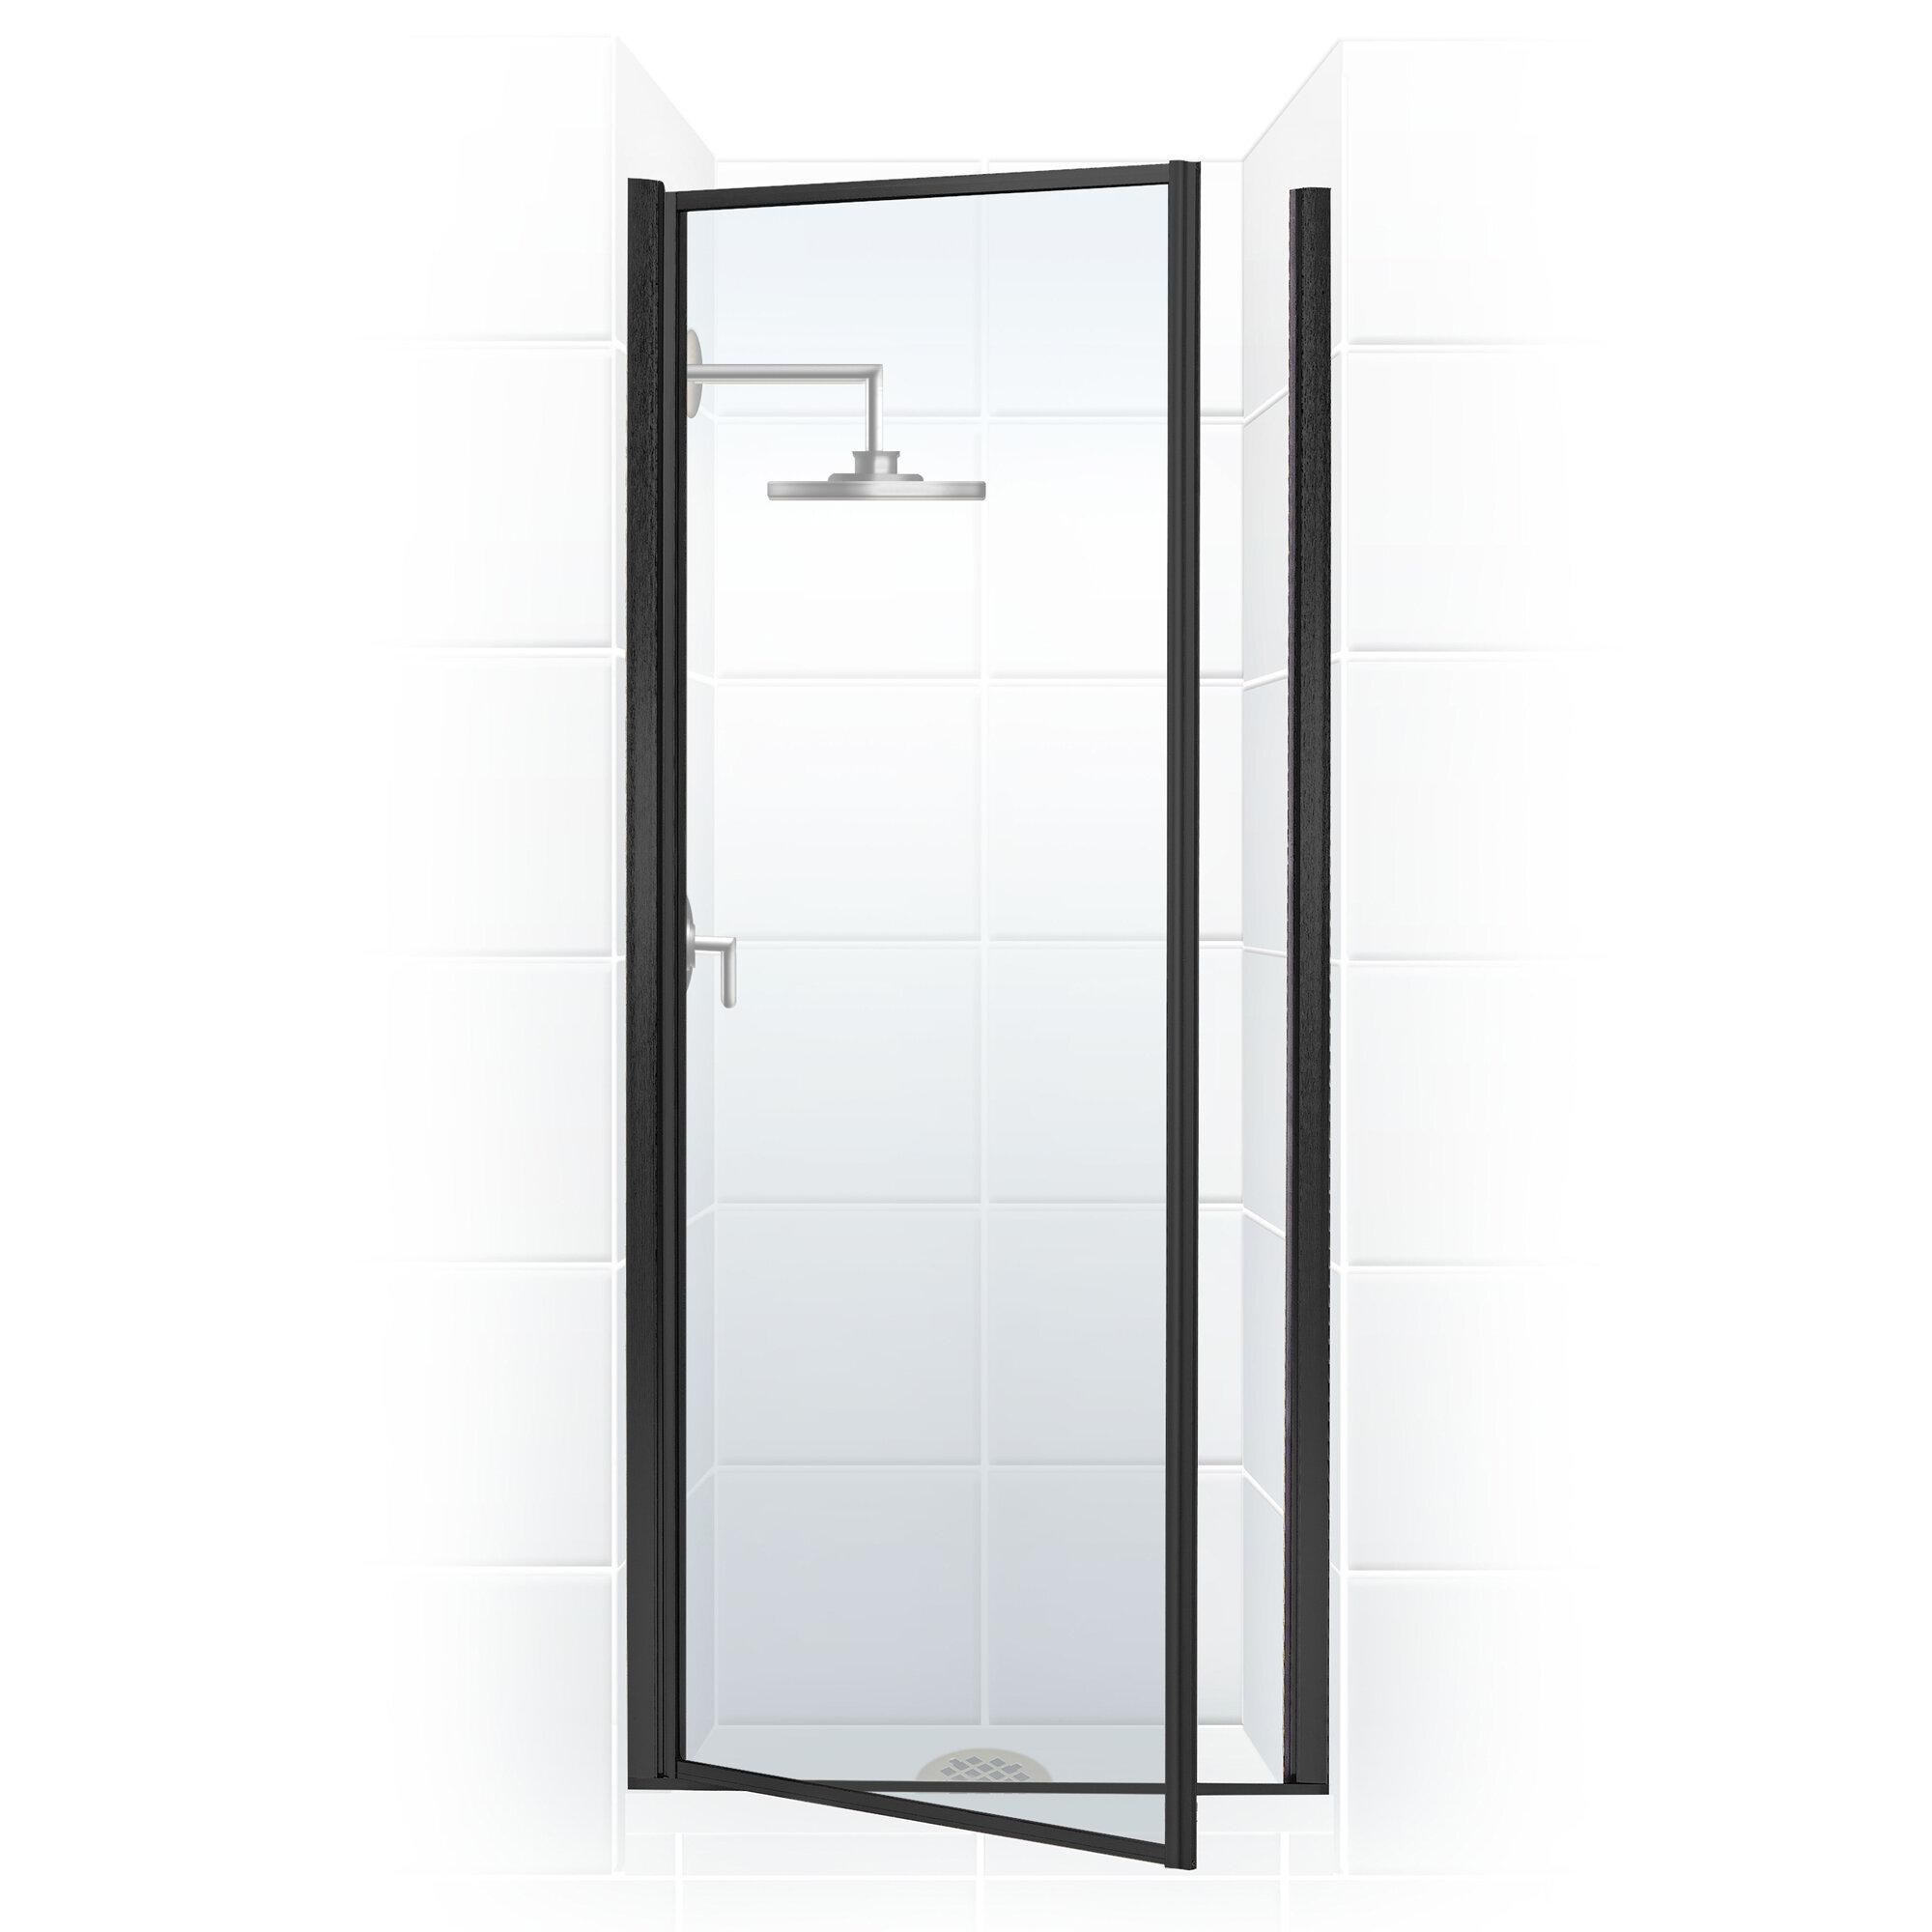 Legend Series 29 X 64 Hinged Framed Shower Door